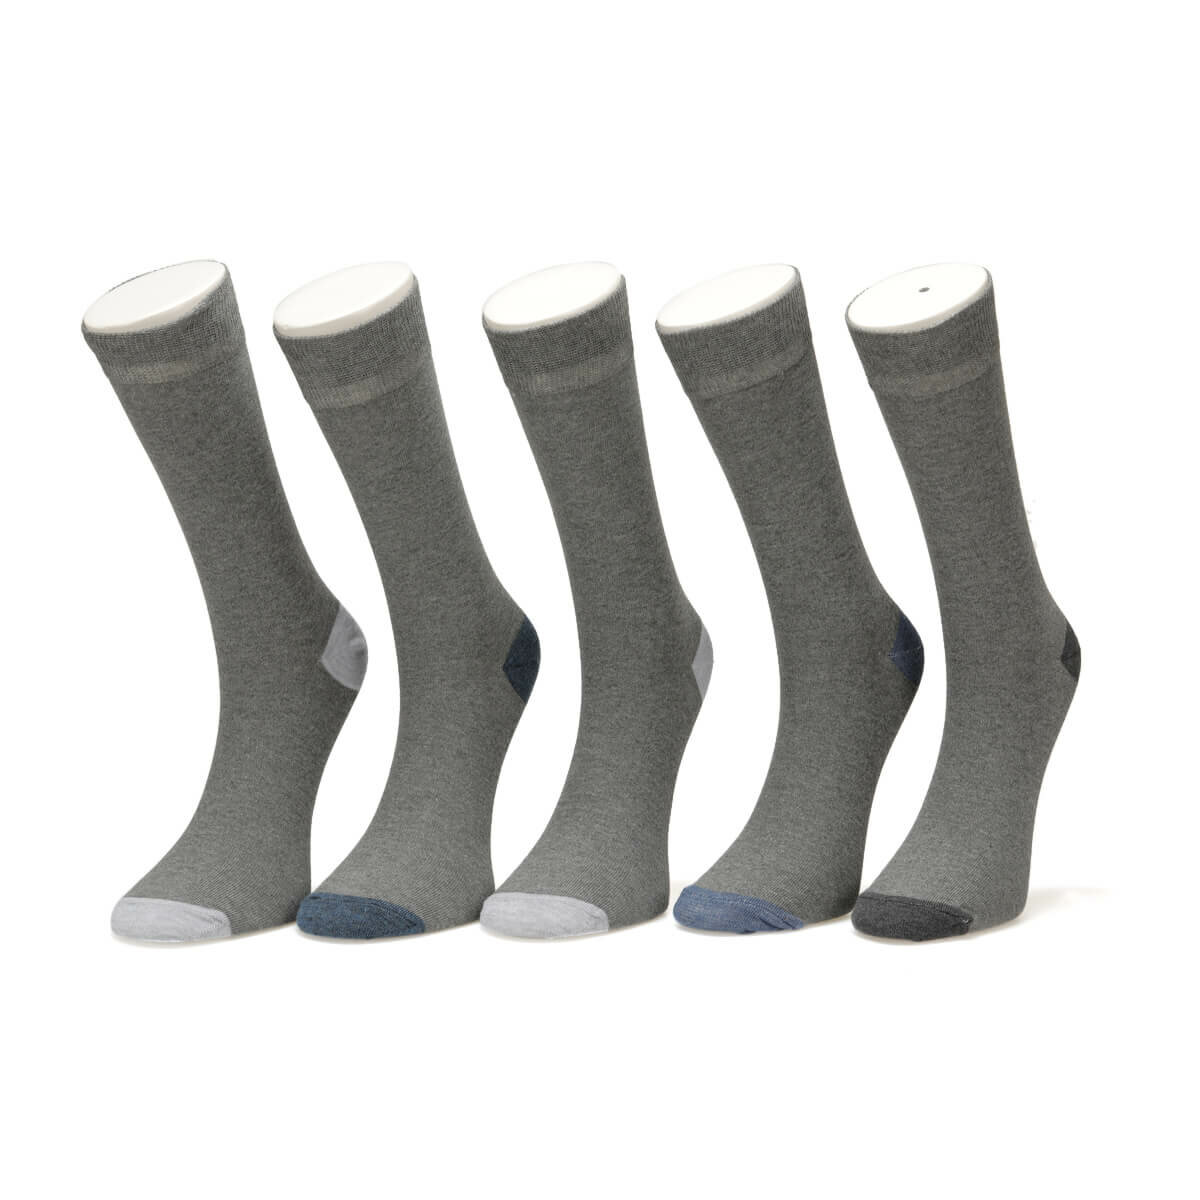 FLO COLOR 5 LI SKT-M GRAY MULTI Male Socket Socks Garamond